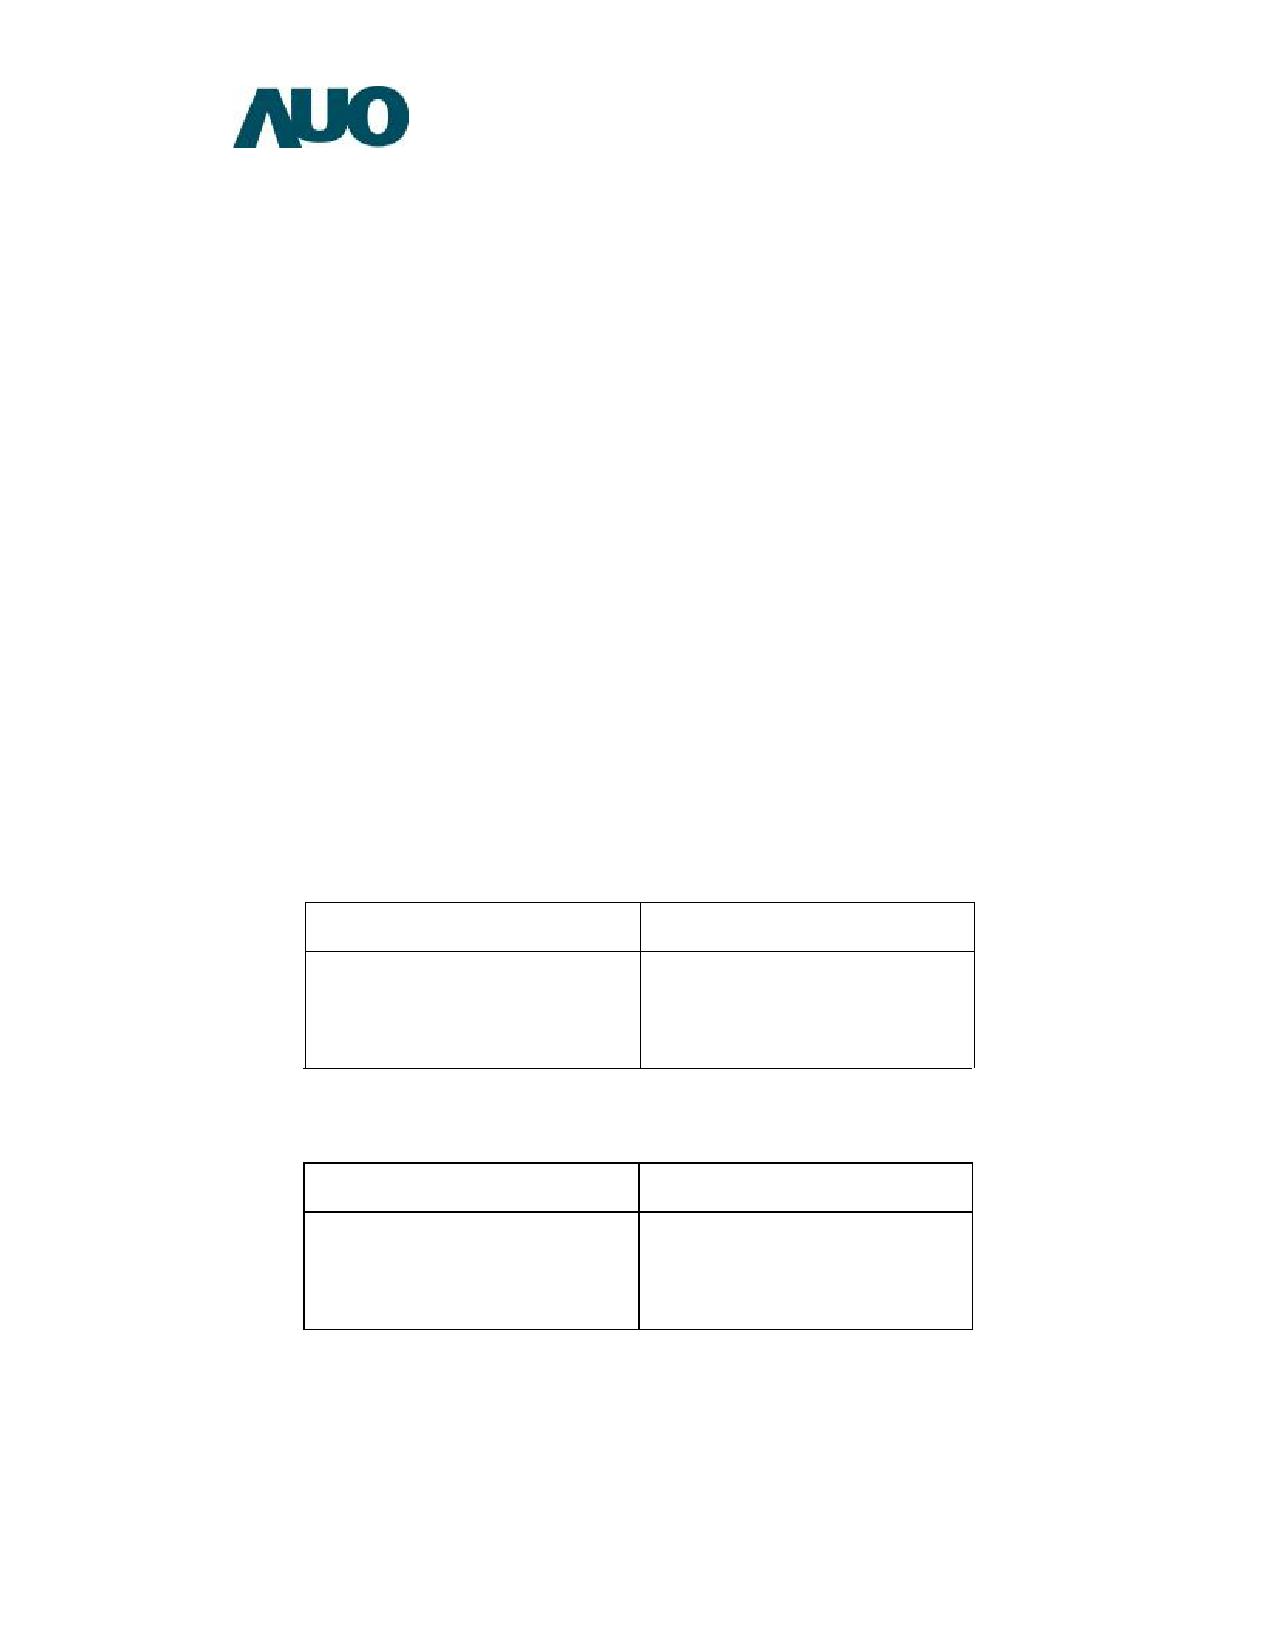 G0121SN01-V0 datasheet